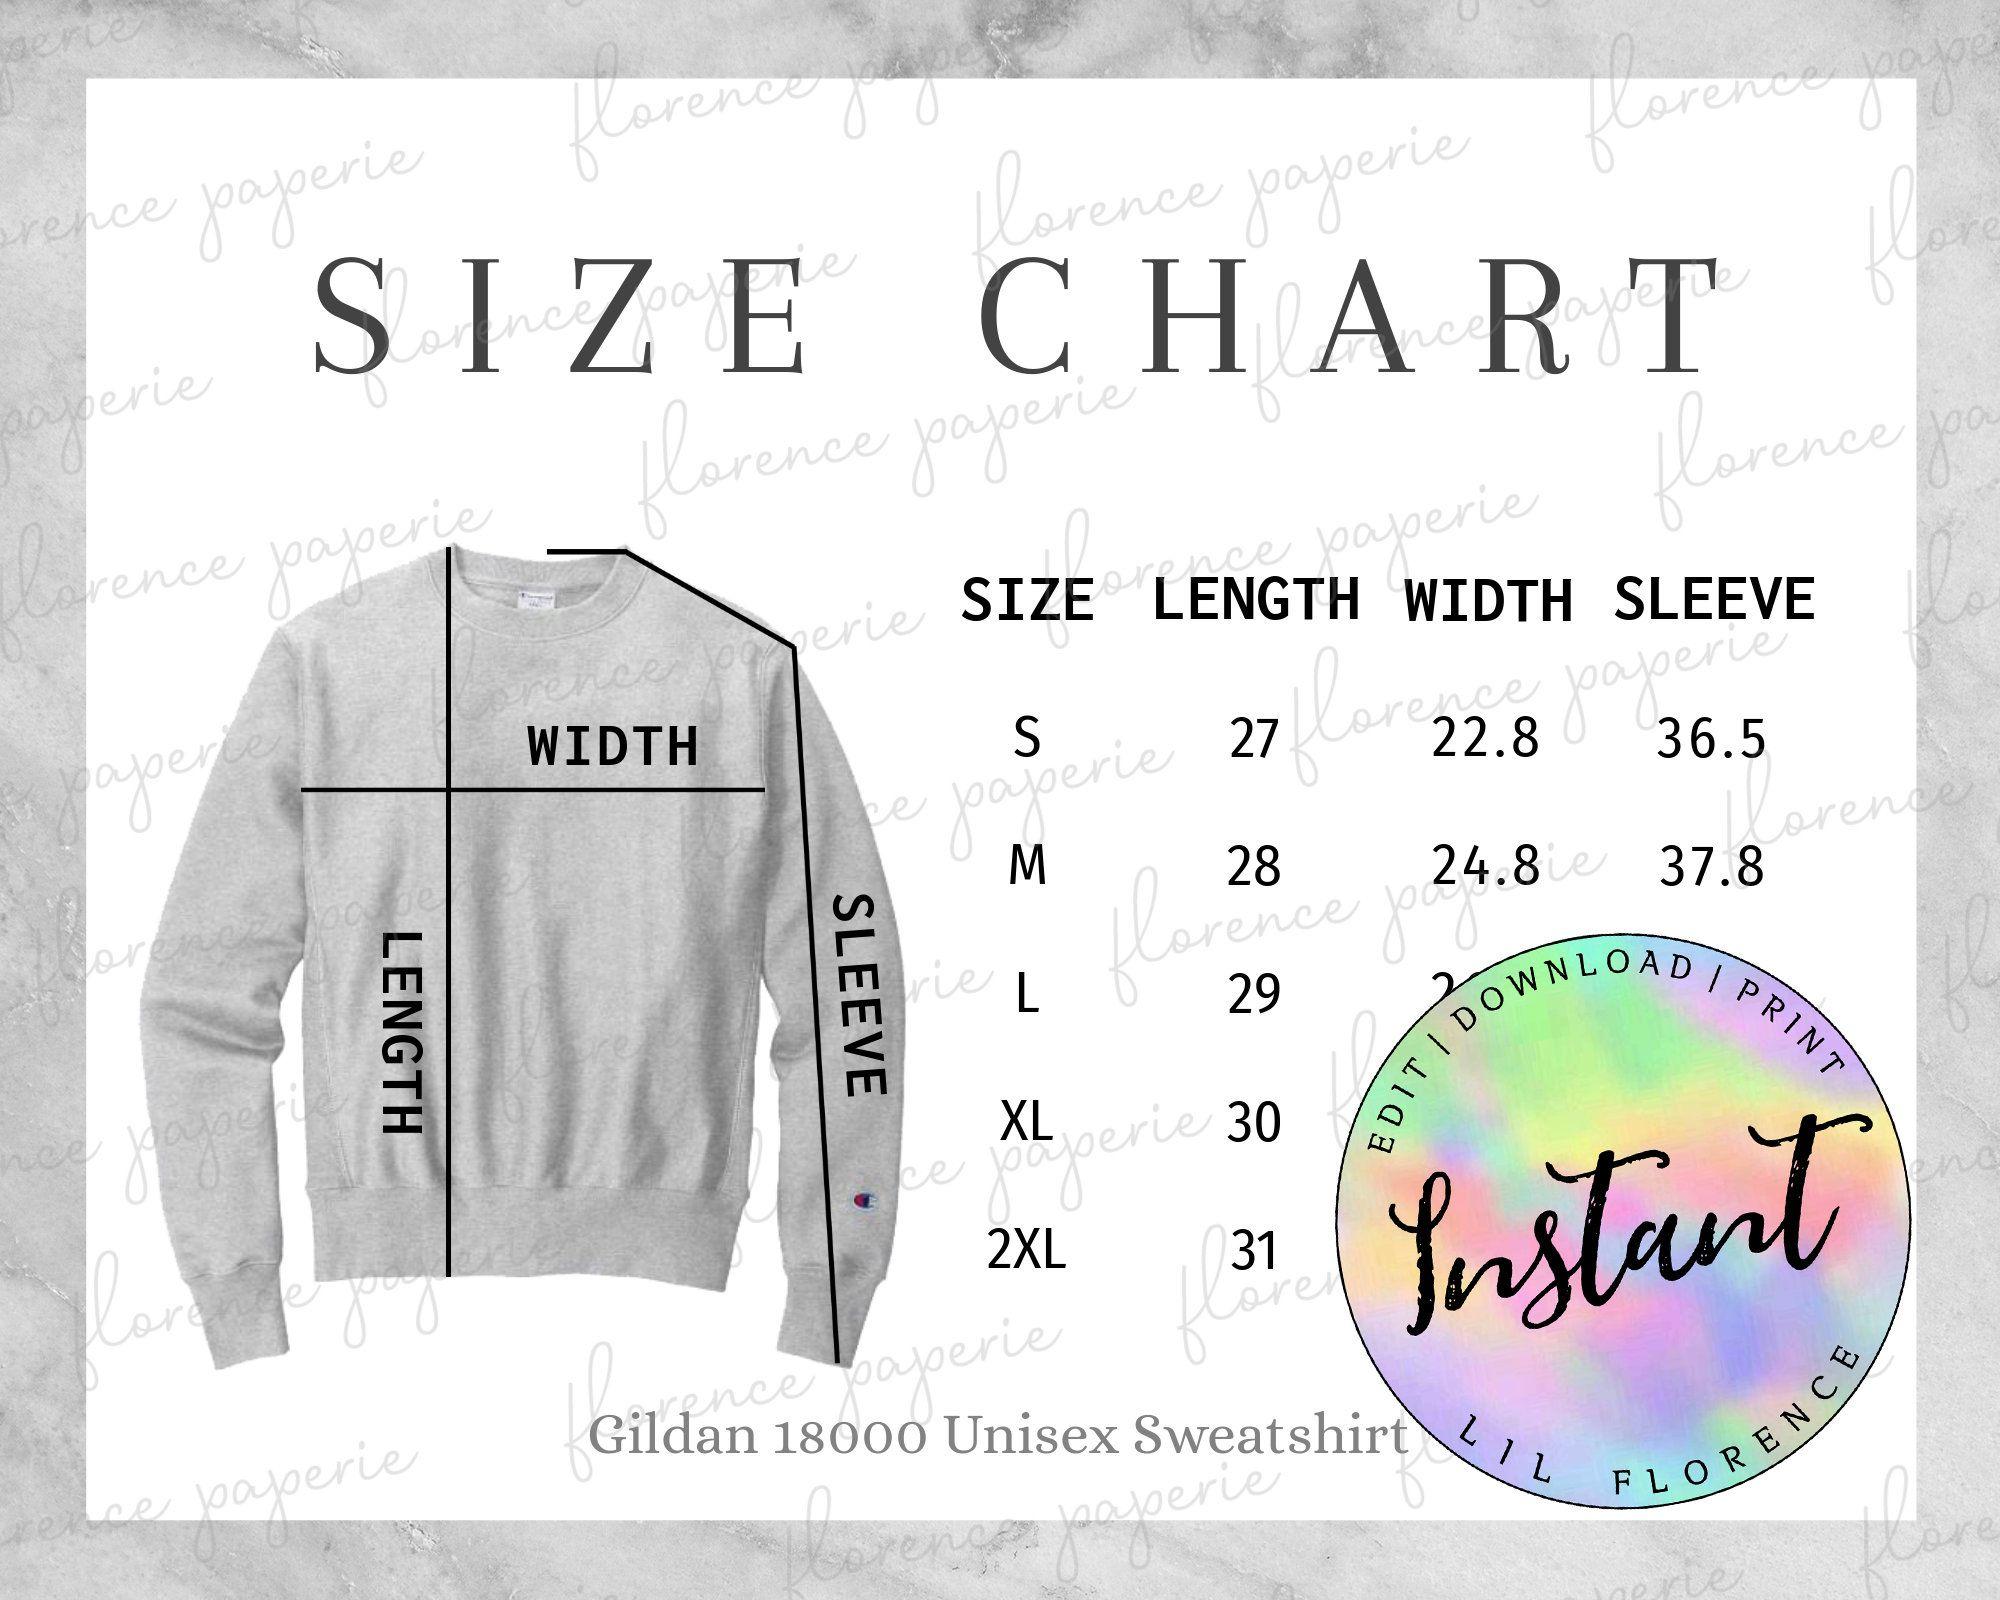 Champion S149 Sweatshirt Size Chart Men S Champion S149 Crew Neck Sweatshirt For Printful Downloadable Printab Long Sleeve Tshirt Men Size Chart Sweatshirts [ 1600 x 2000 Pixel ]